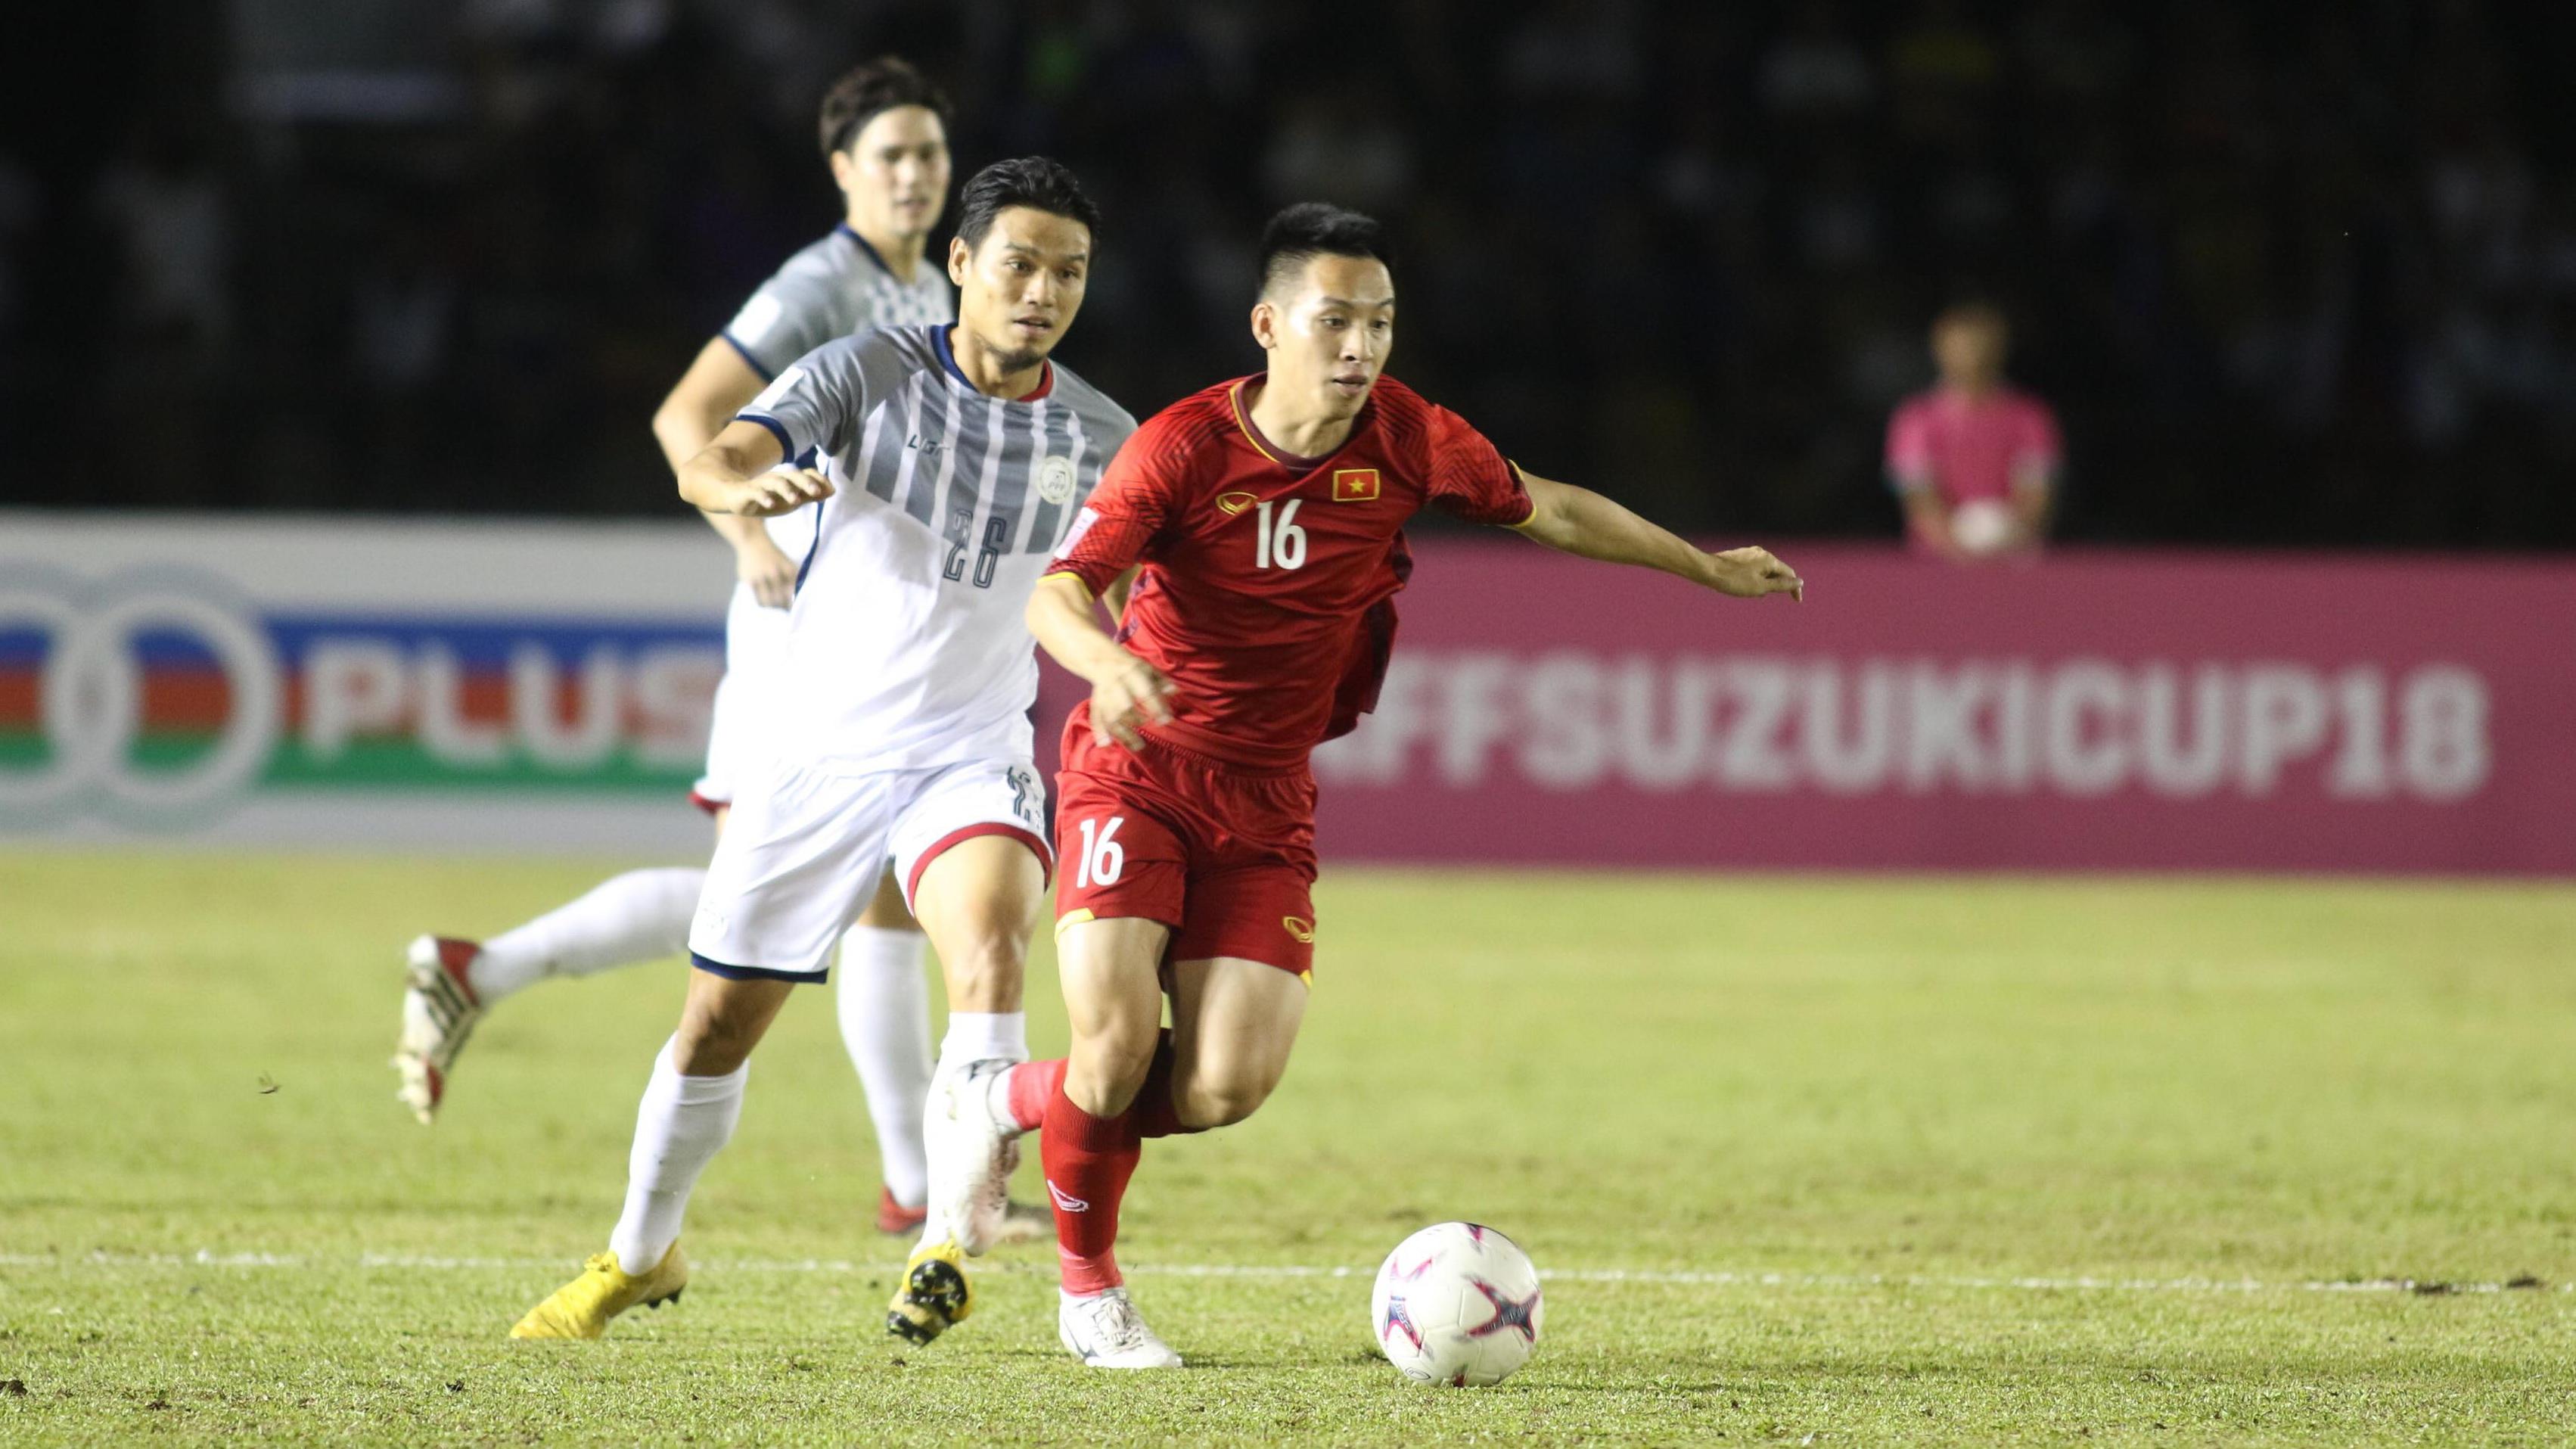 Đỗ Hùng Dũng Philippines vs Việt Nam AFF Suzuki Cup 2018